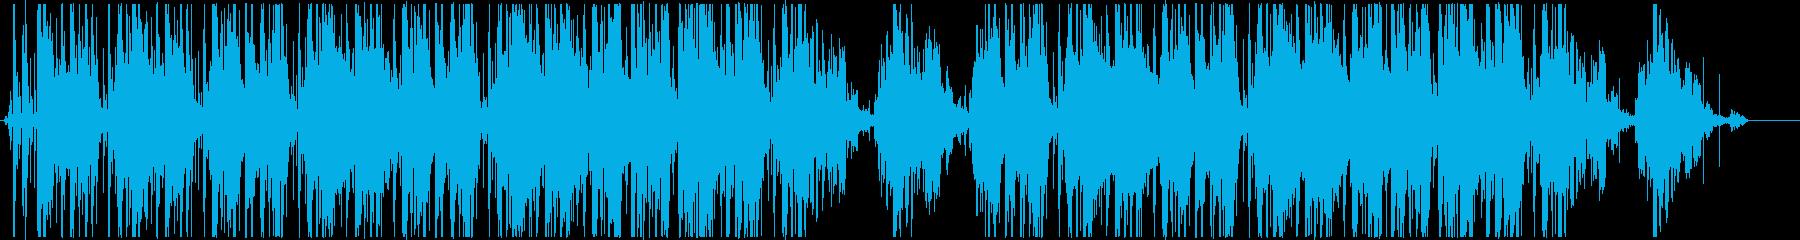 Lo-Fi、ジャジーなヒップホップの再生済みの波形